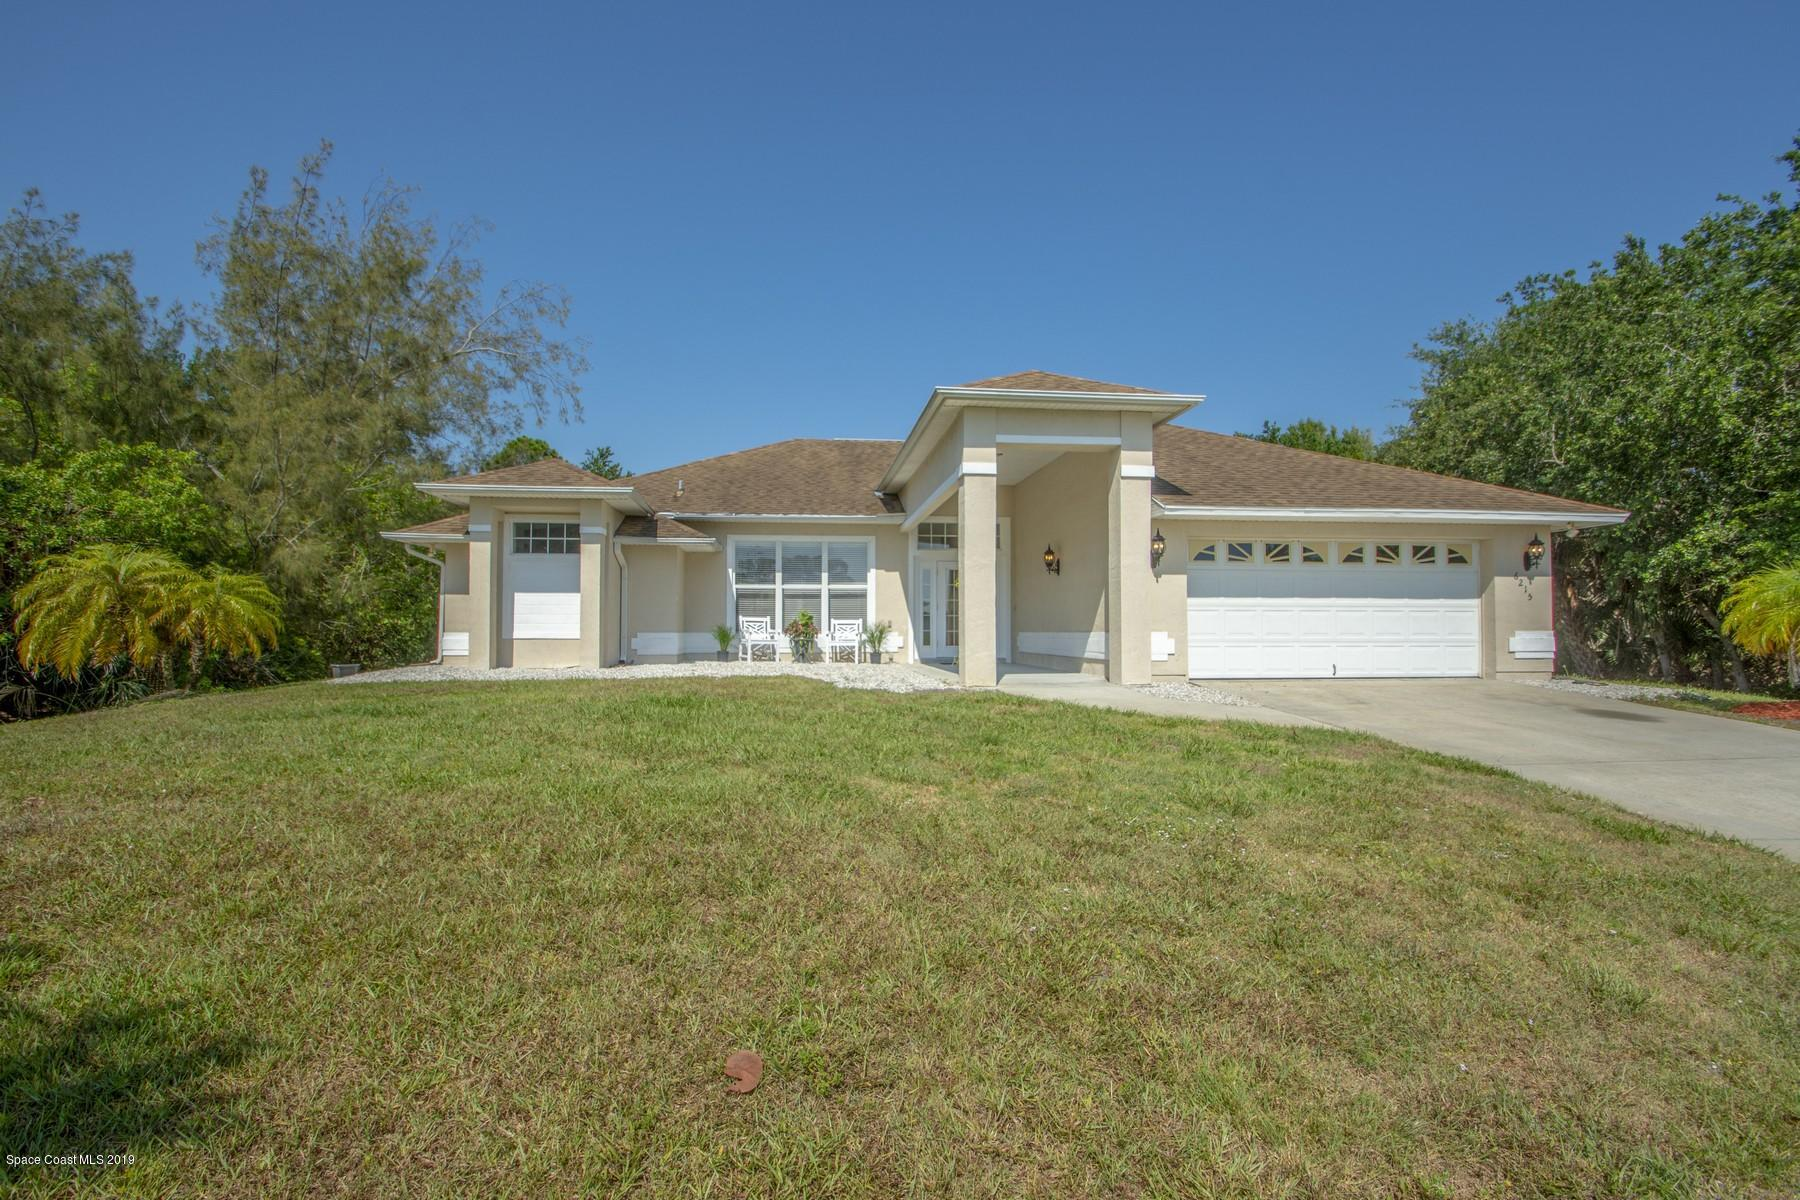 Single Family Homes for Sale at 6215 109th Sebastian, Florida 32958 United States